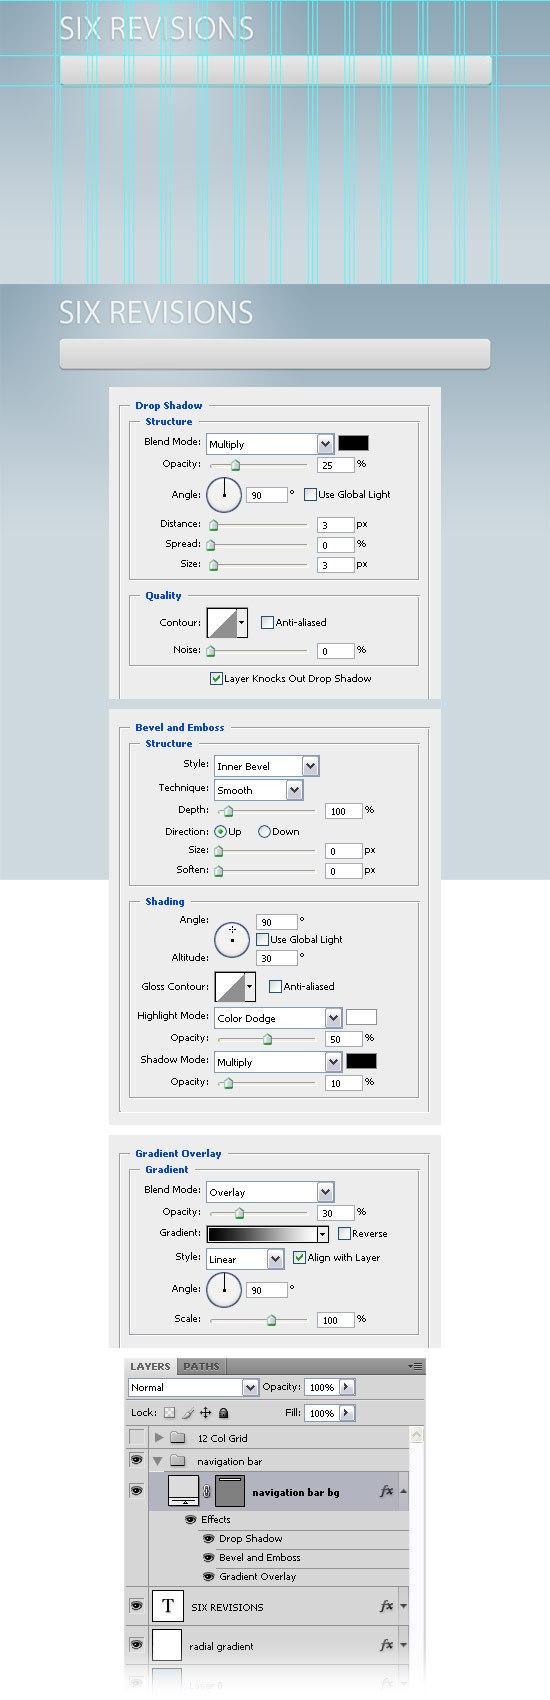 Creating the navigation bar